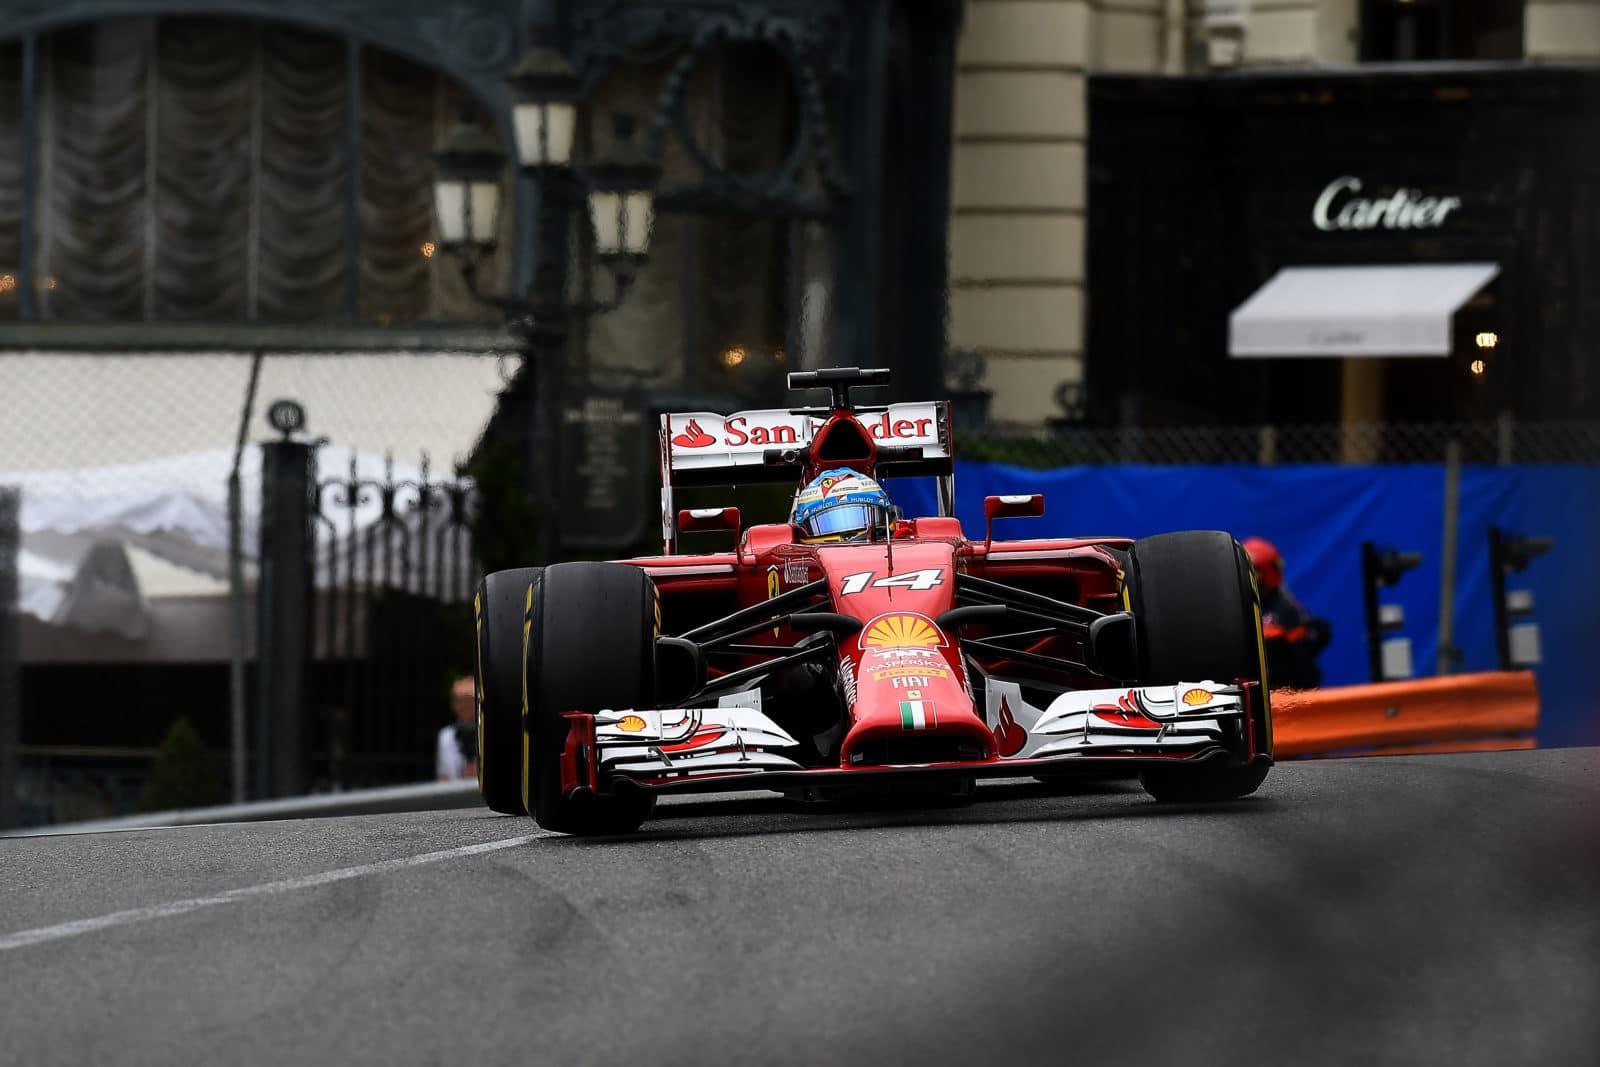 Fernando Alonso - 05/22/2014